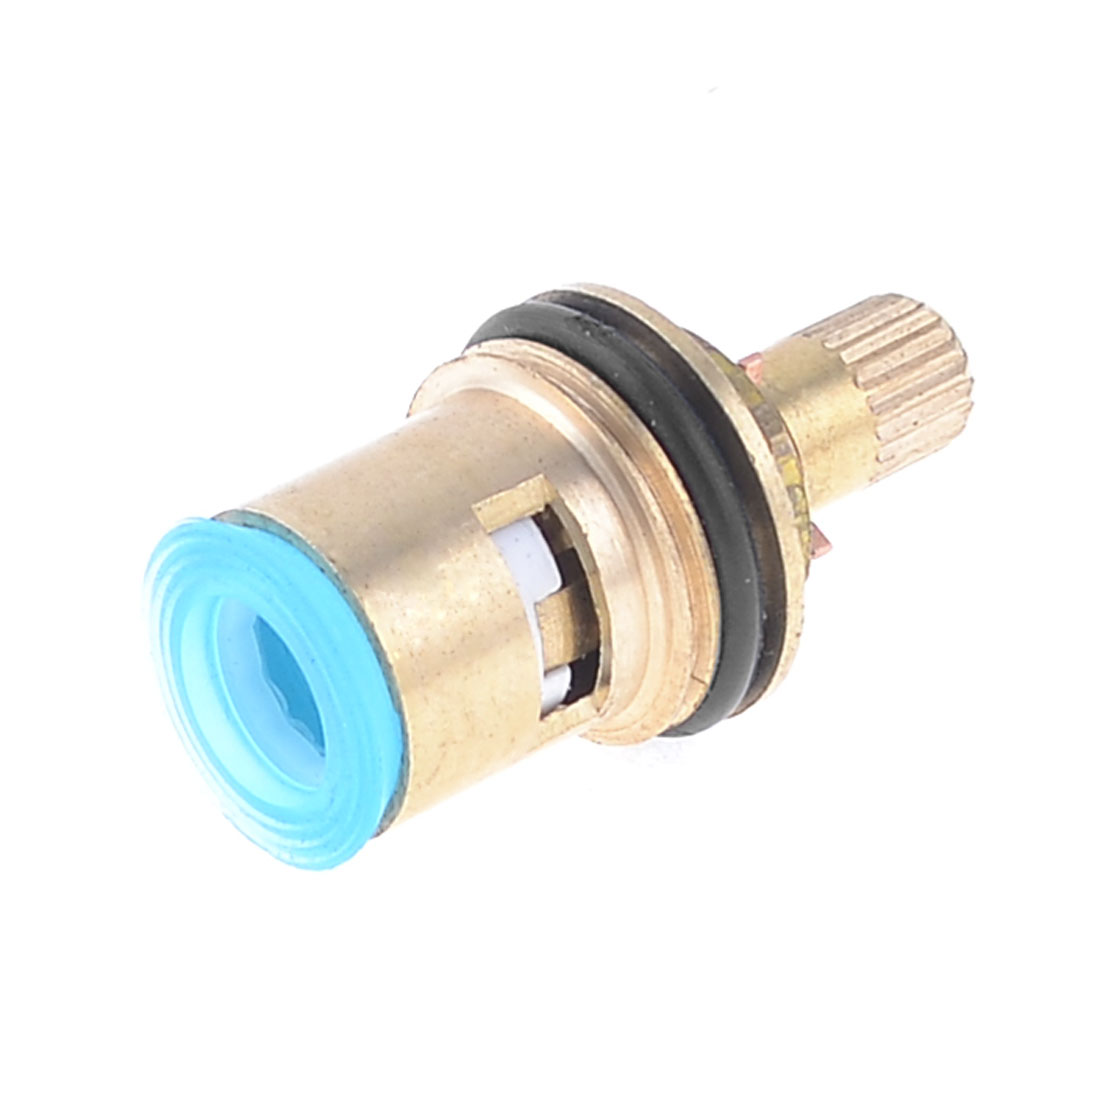 Gold Tone Brass Faucet Ceramic Cartridge Disc Valve Core Spool Stem 17x8mm